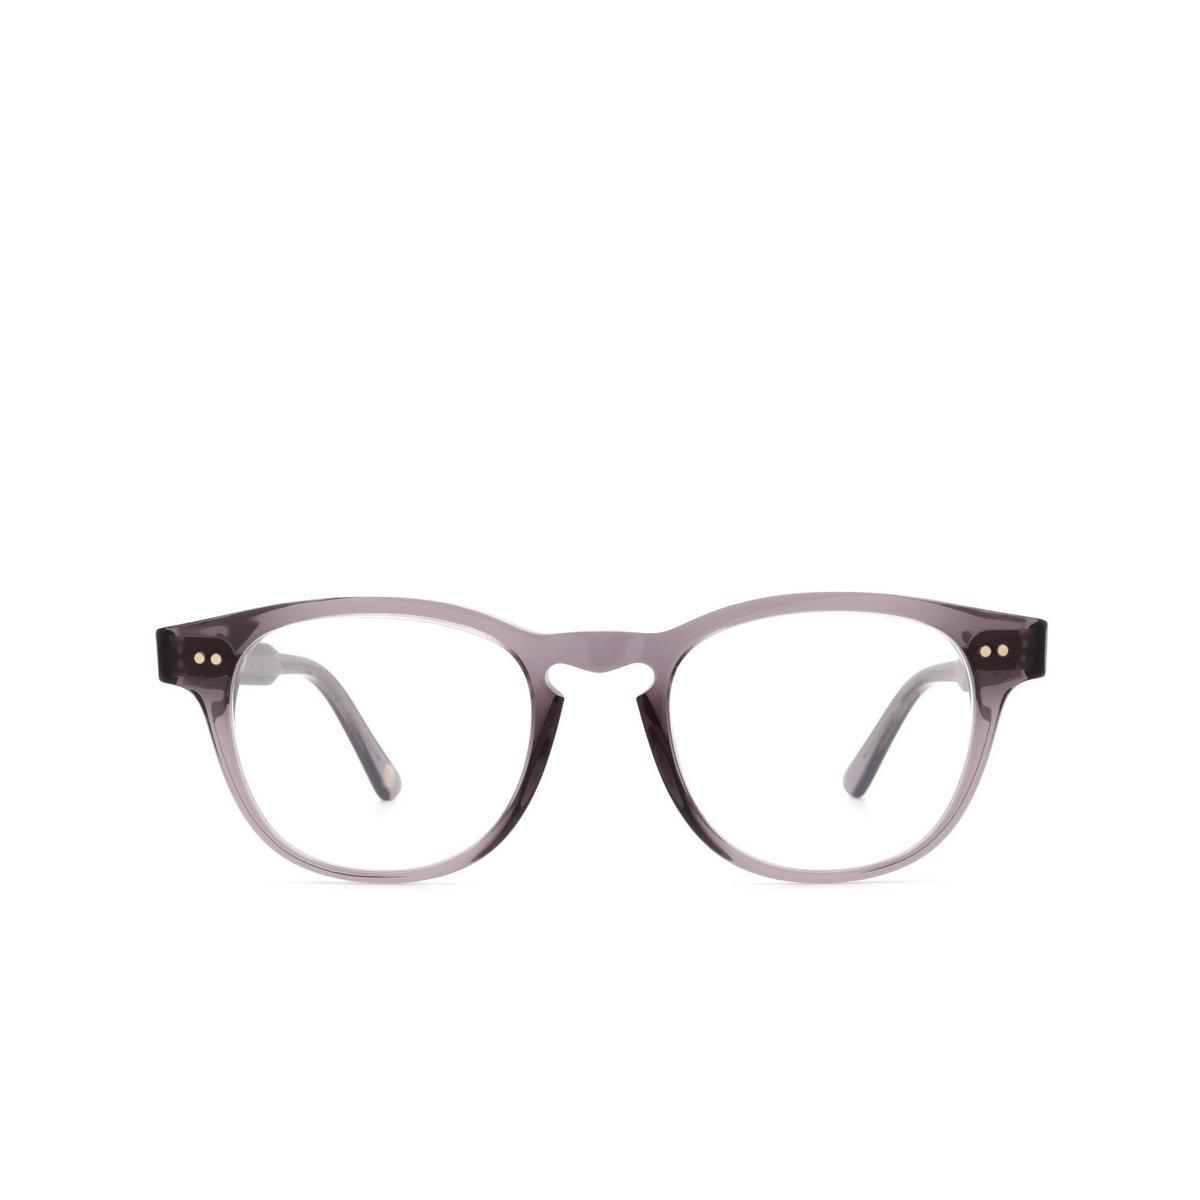 Ahlem® Square Eyeglasses: Rue Cler Optic color Slategrey Light.